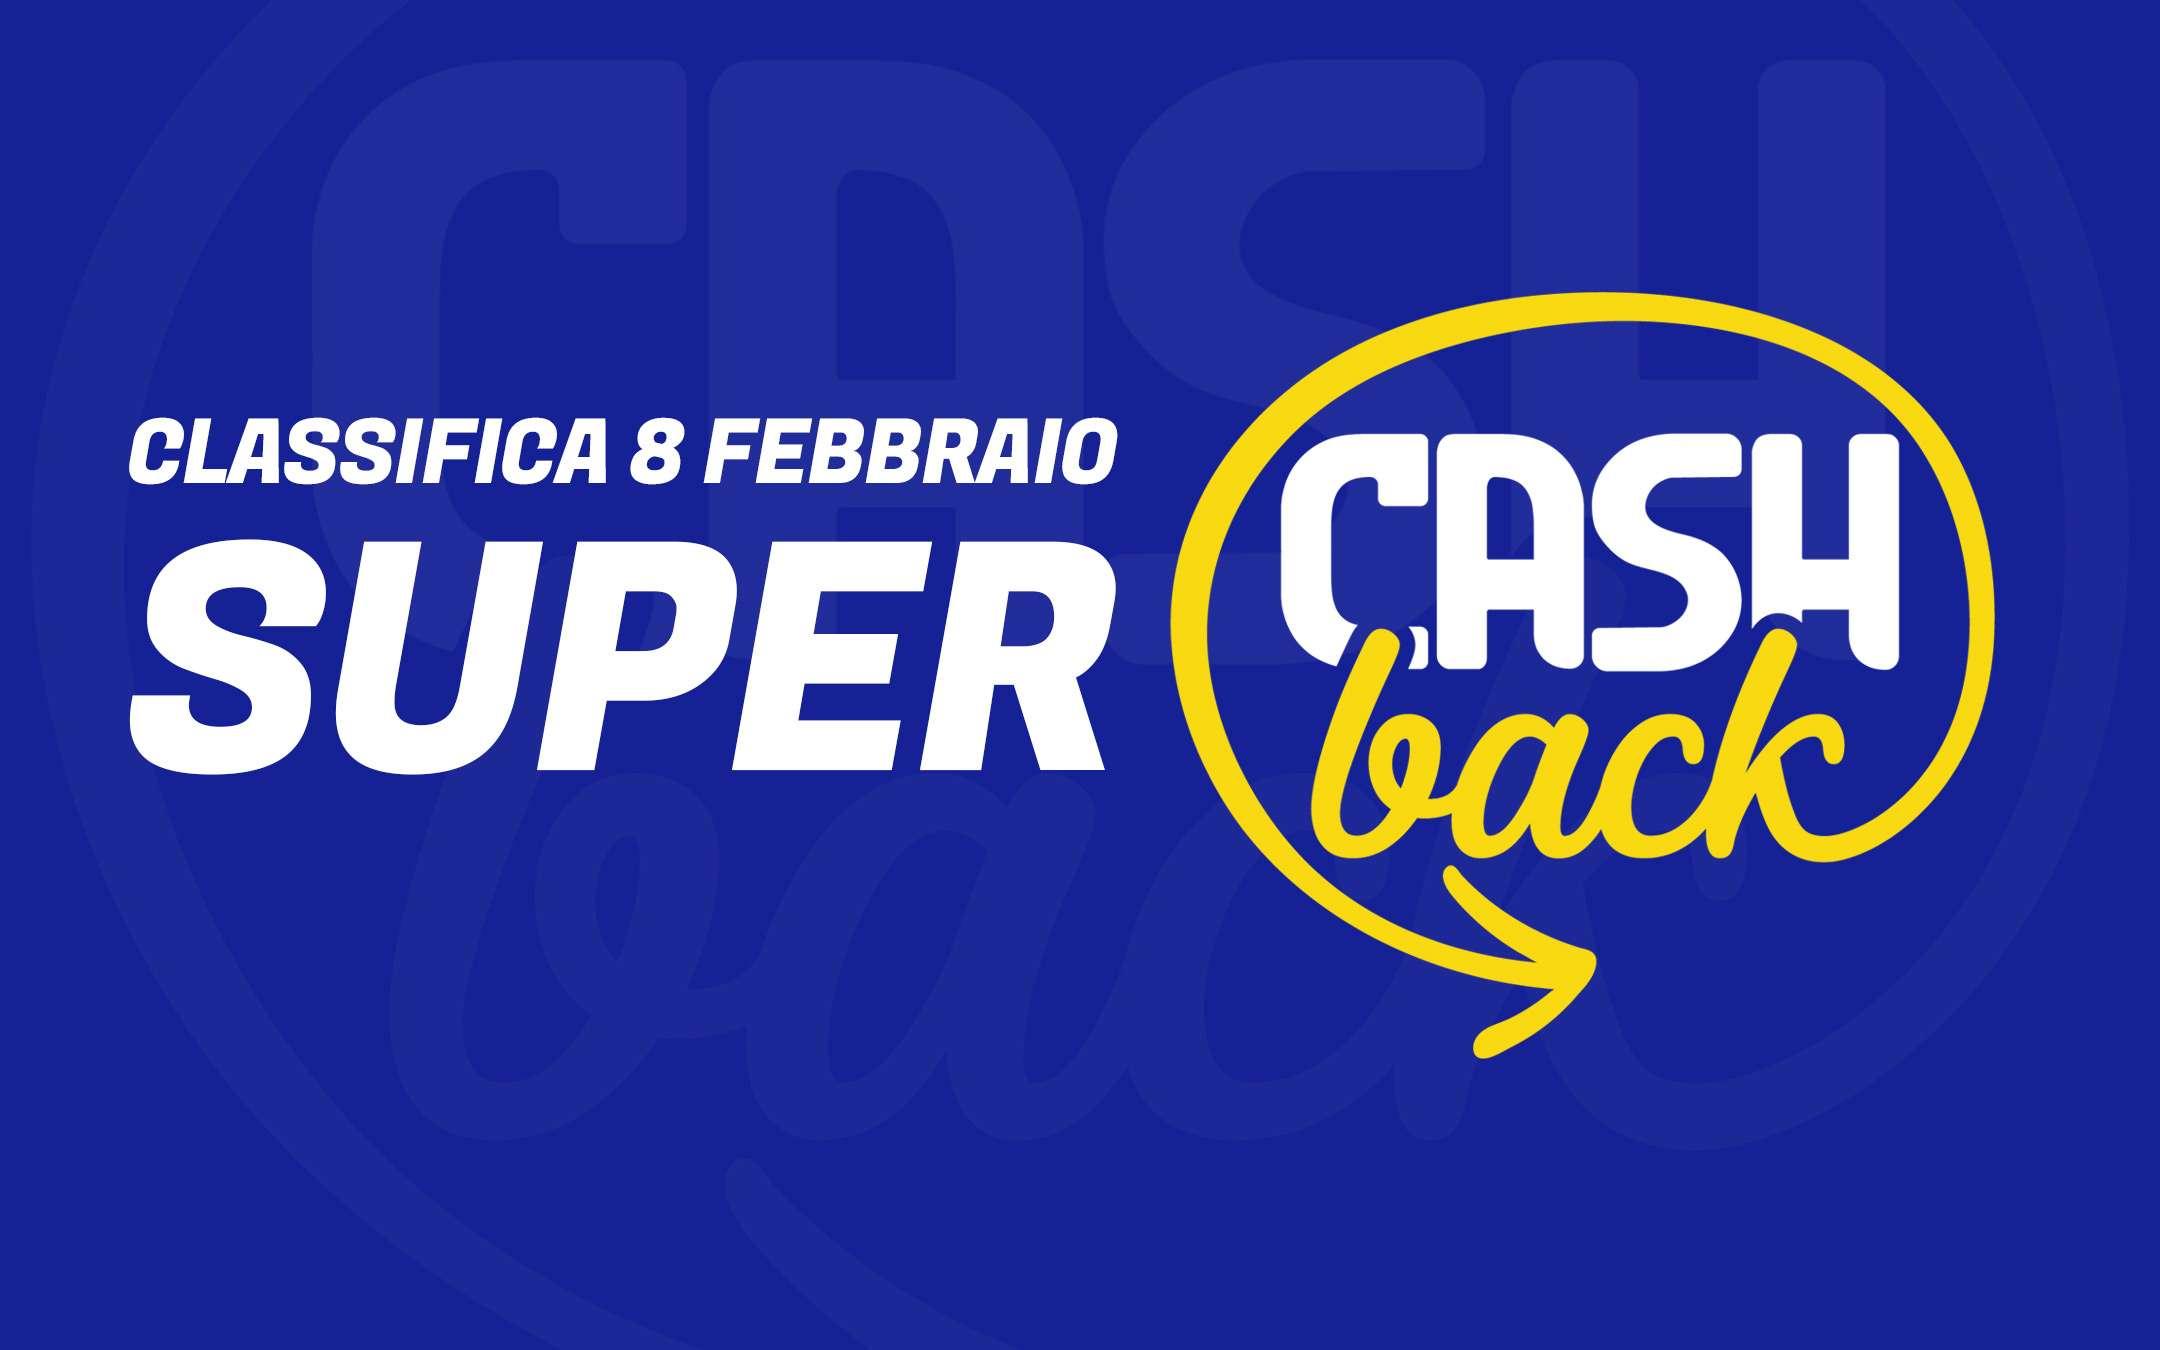 Super Cashback: transaction ranking, February 8th